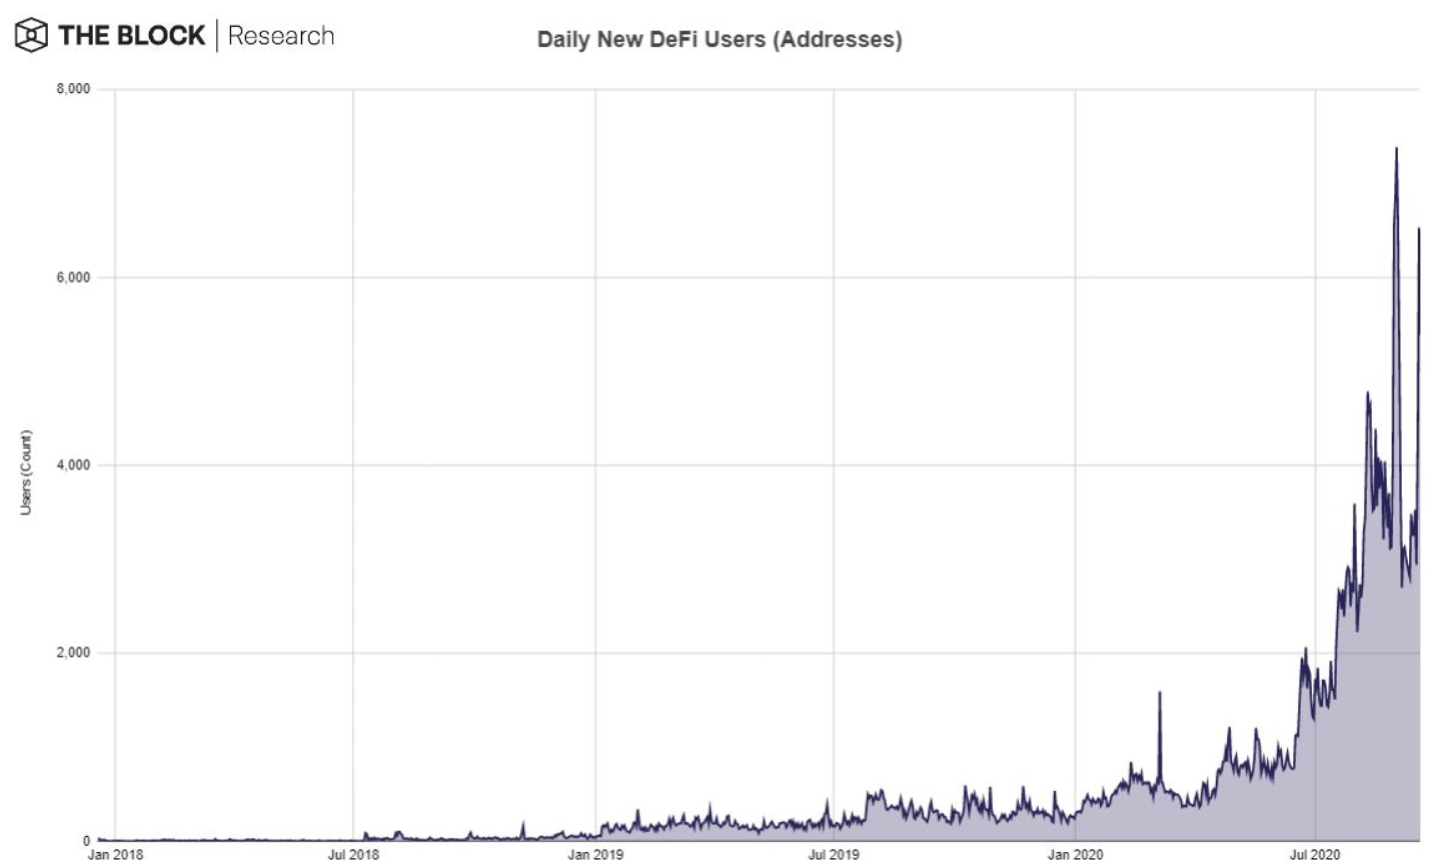 DeFi泡沫已经破裂,但数据指标显示DeFi本身却变得更加强大